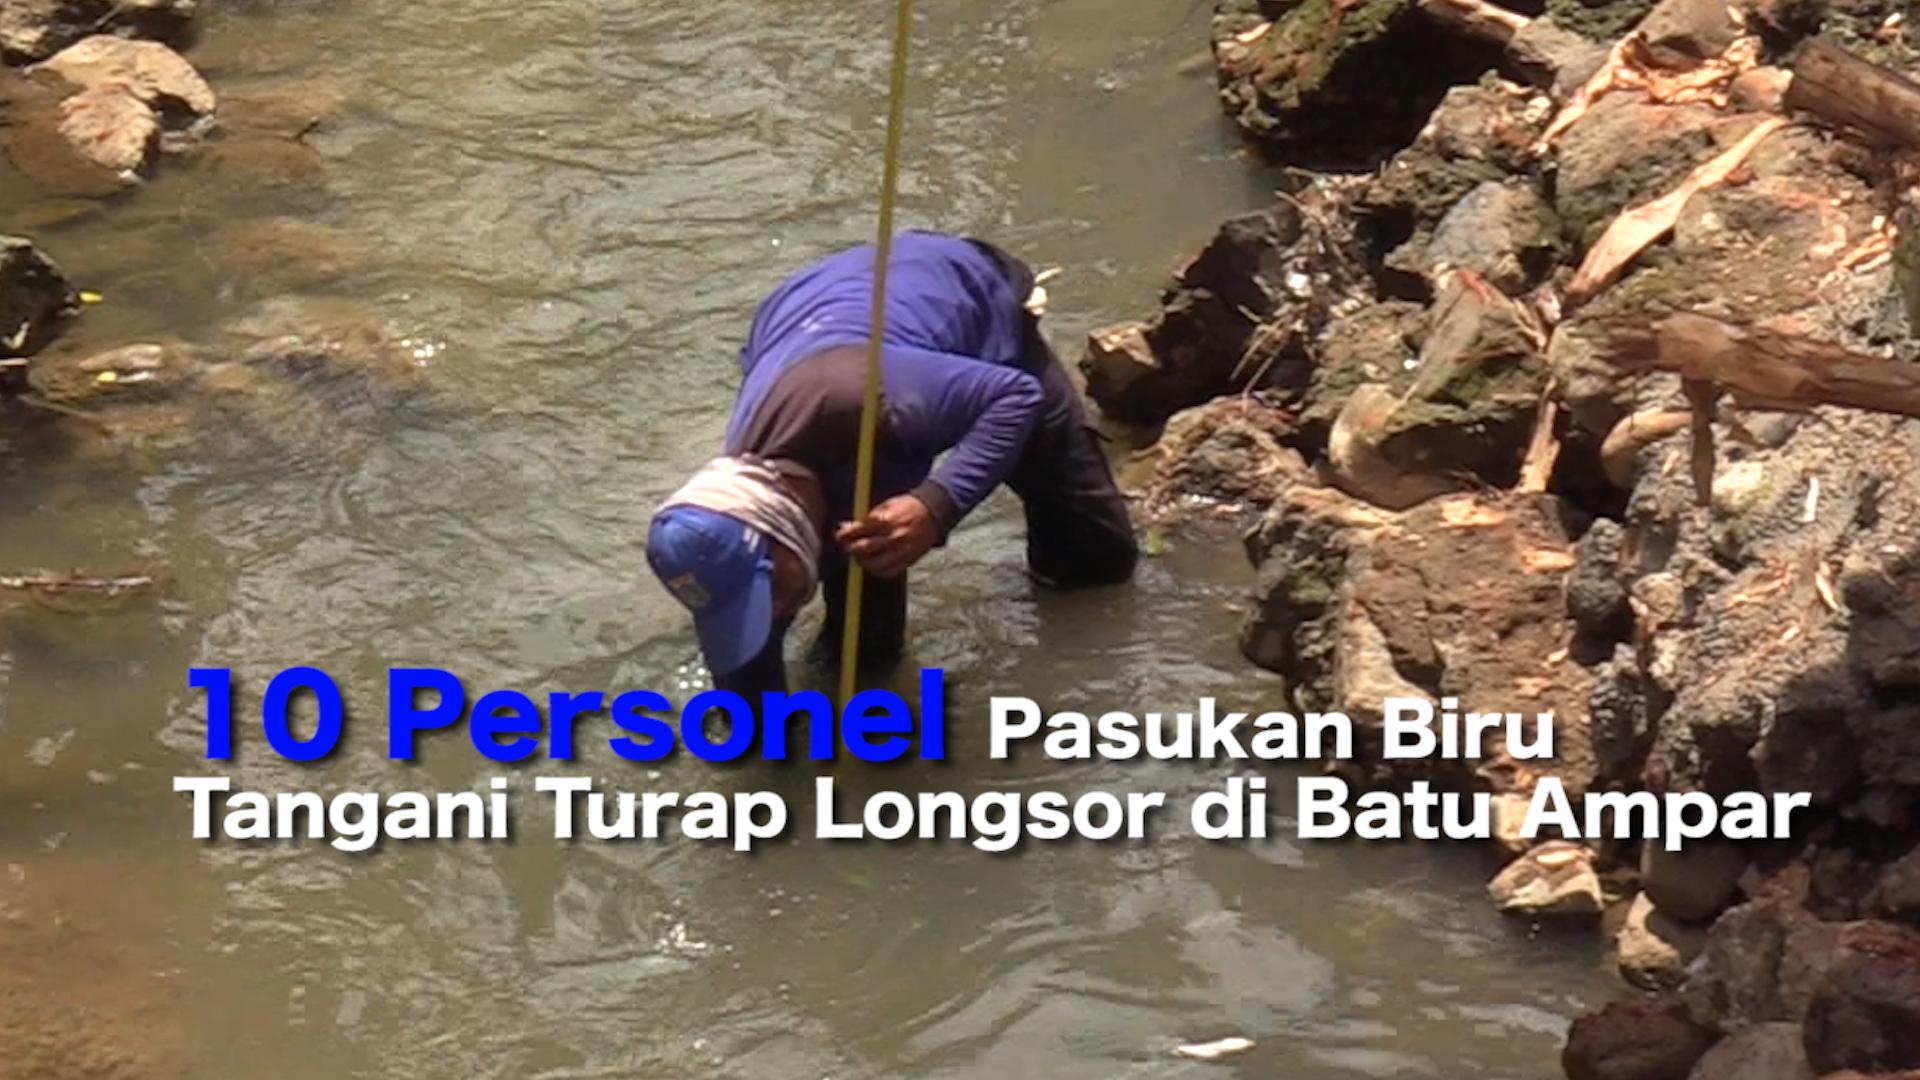 10 Personel Pasukan Biru Tangani Turap Longsor di Batu Ampar